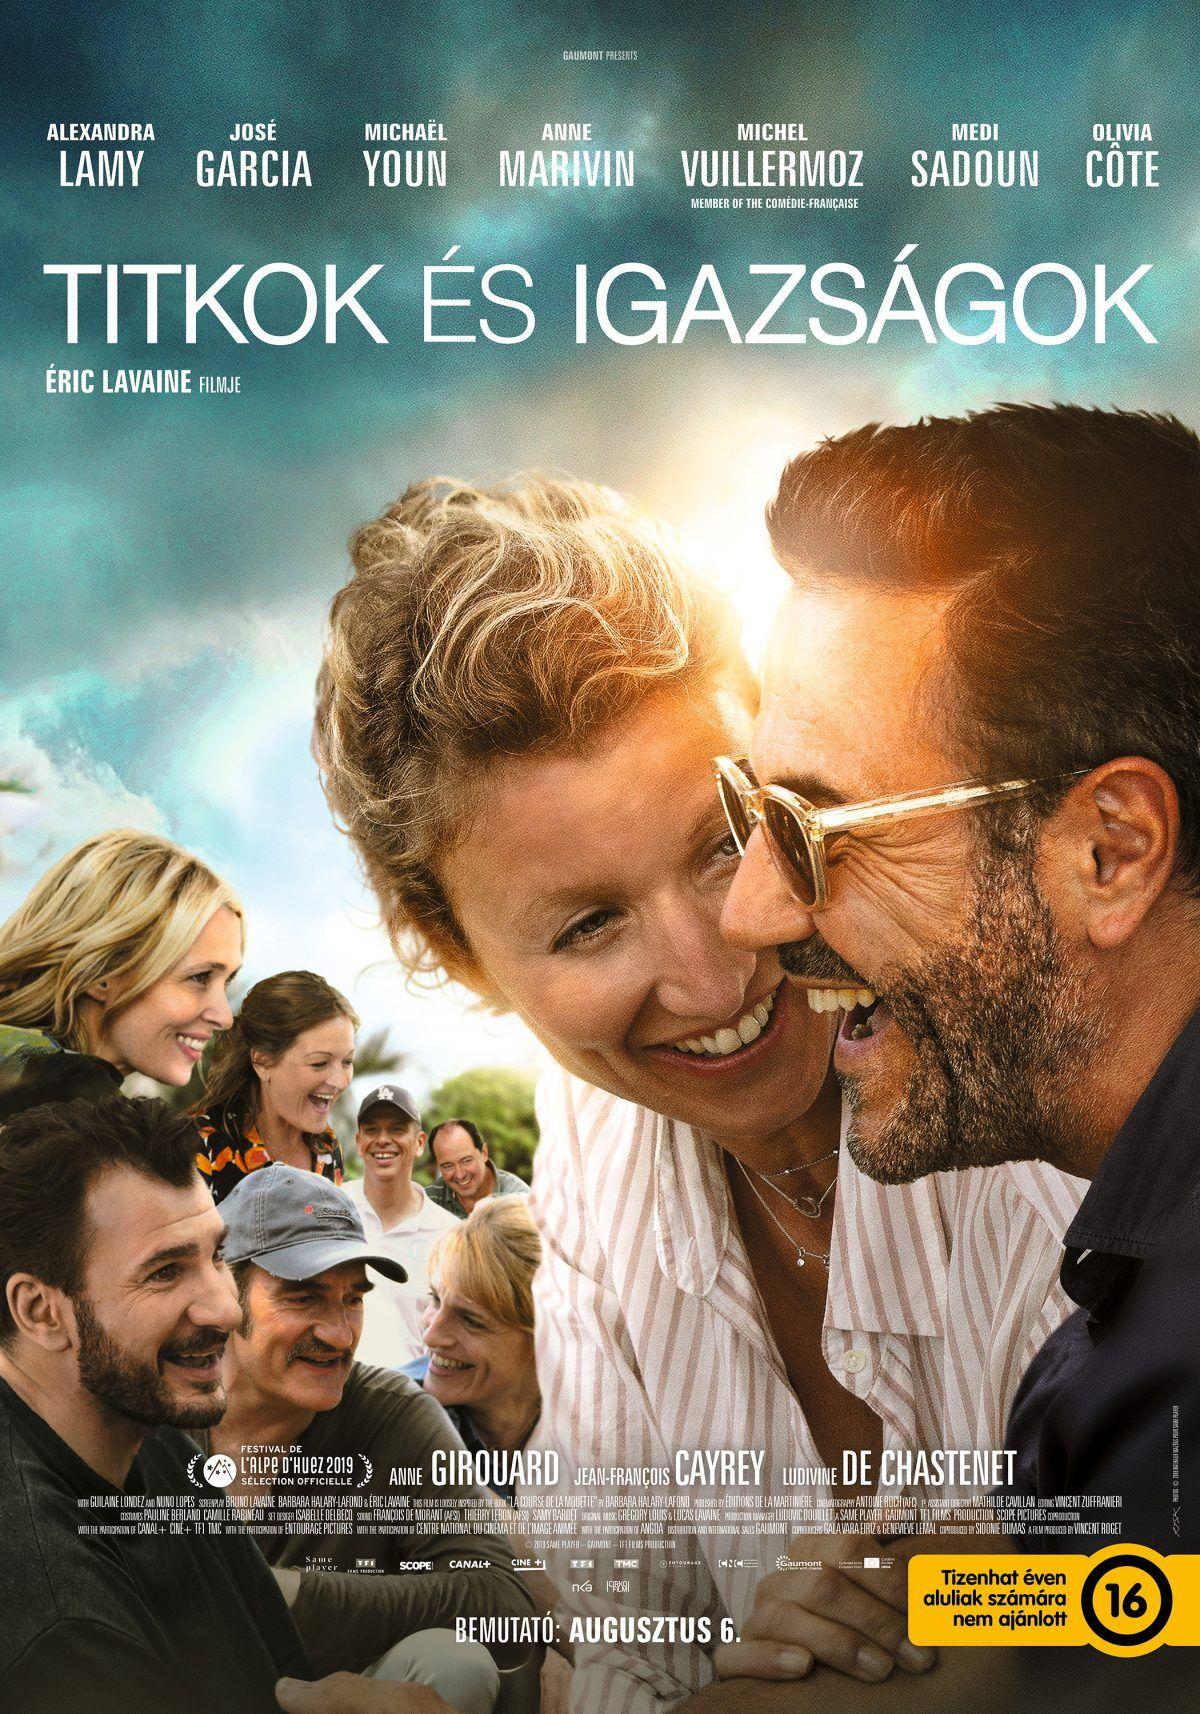 Titkok Es Igazsagok Chamboultout No Filter 2019 Mozi Film Online Magazin Mozinezo Film Good Movies Free Movies Online